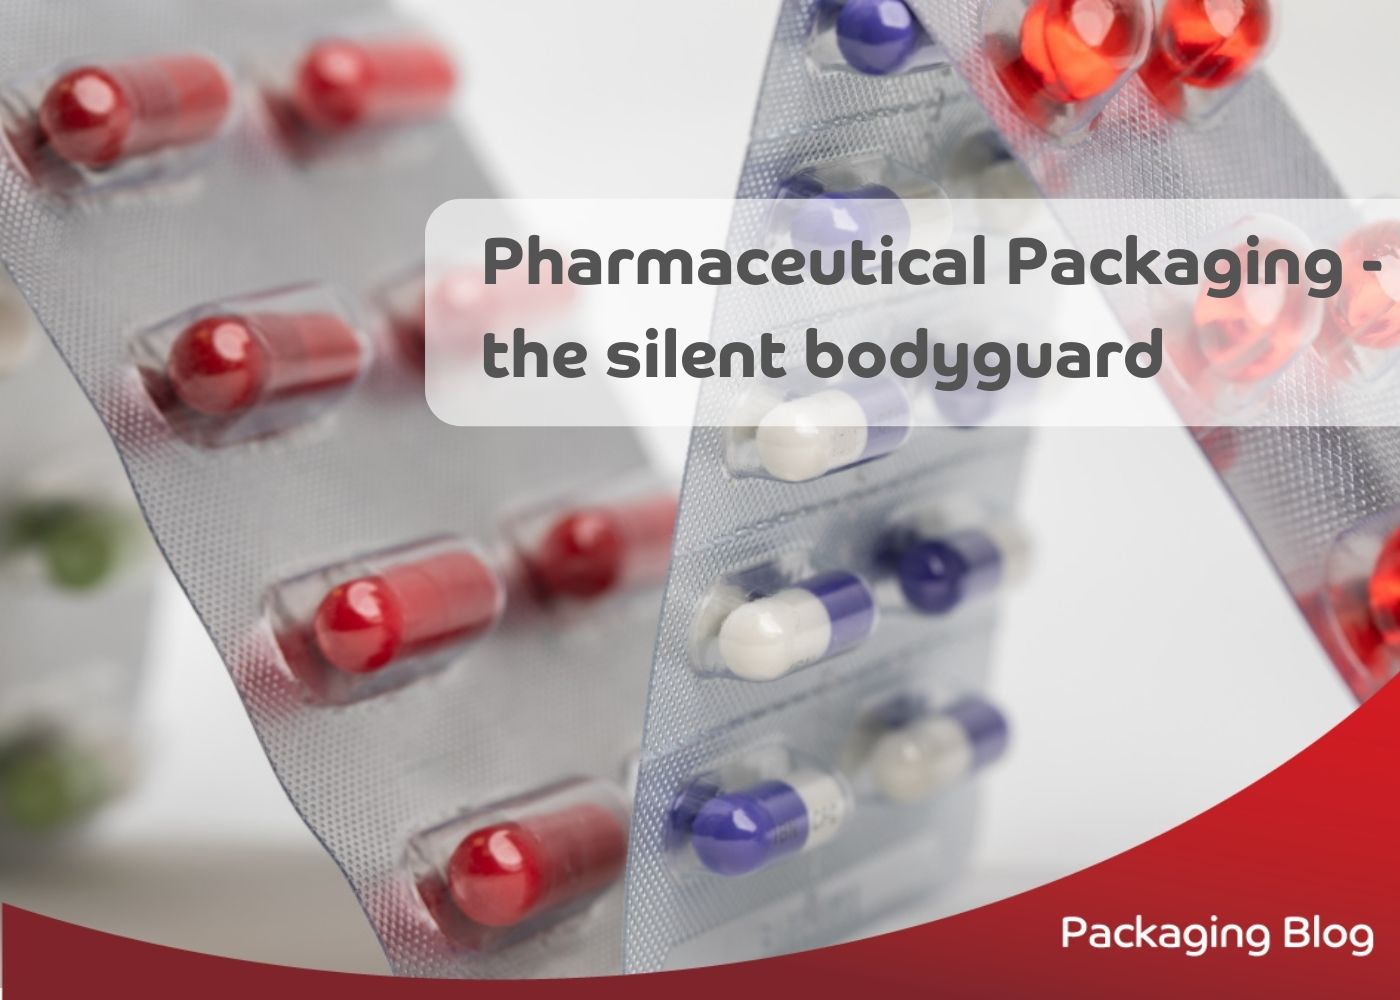 Pharmaceutical packaging: the silent bodyguard